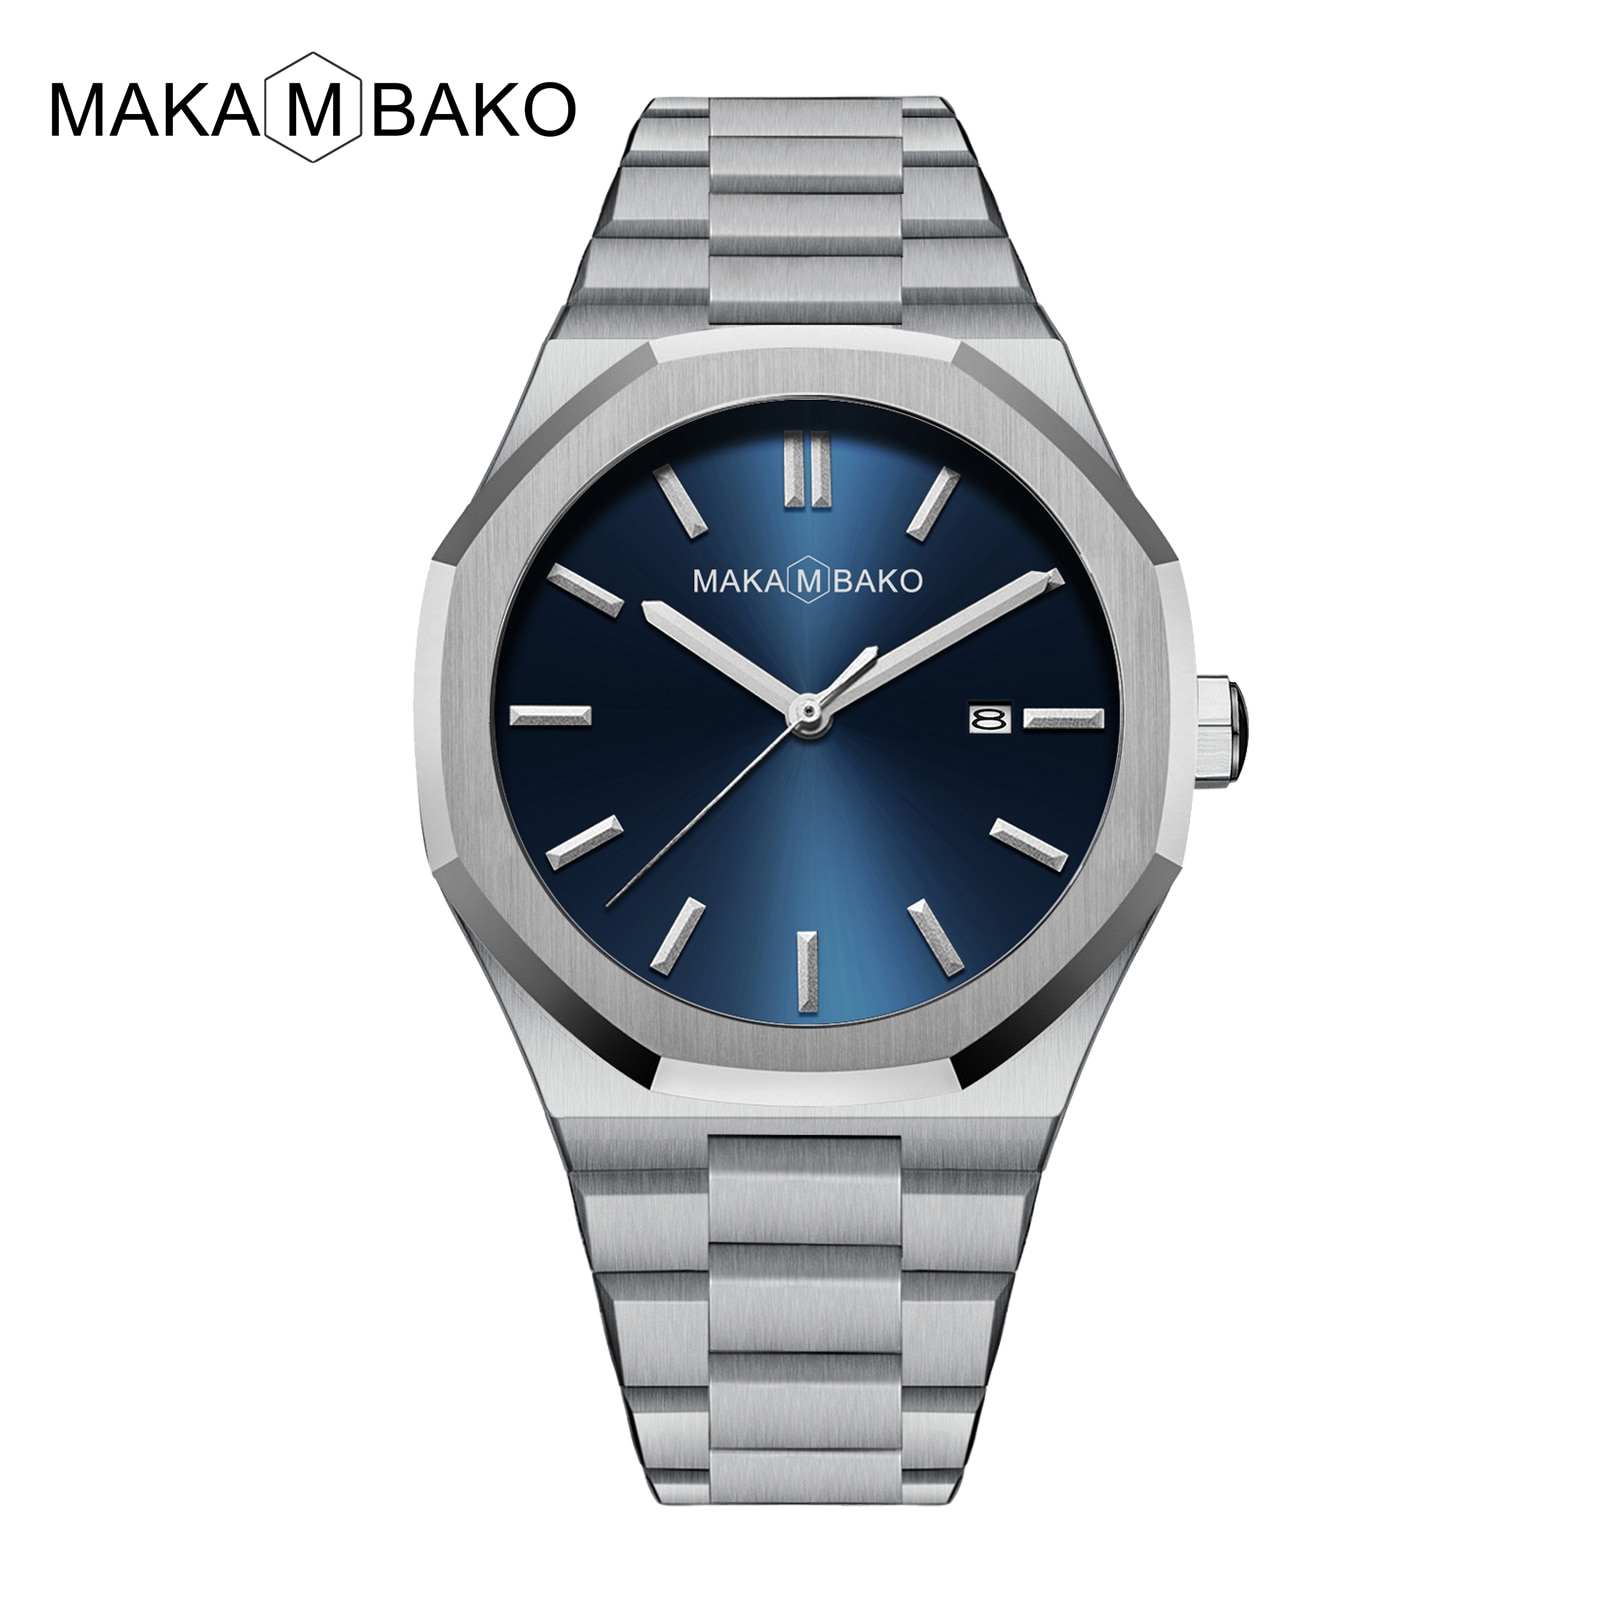 Luxury Stainless Steel Band Men's Watch Fashion Blue Green Dial Japan MIYOTA2115 Mov't Quartz Wrist